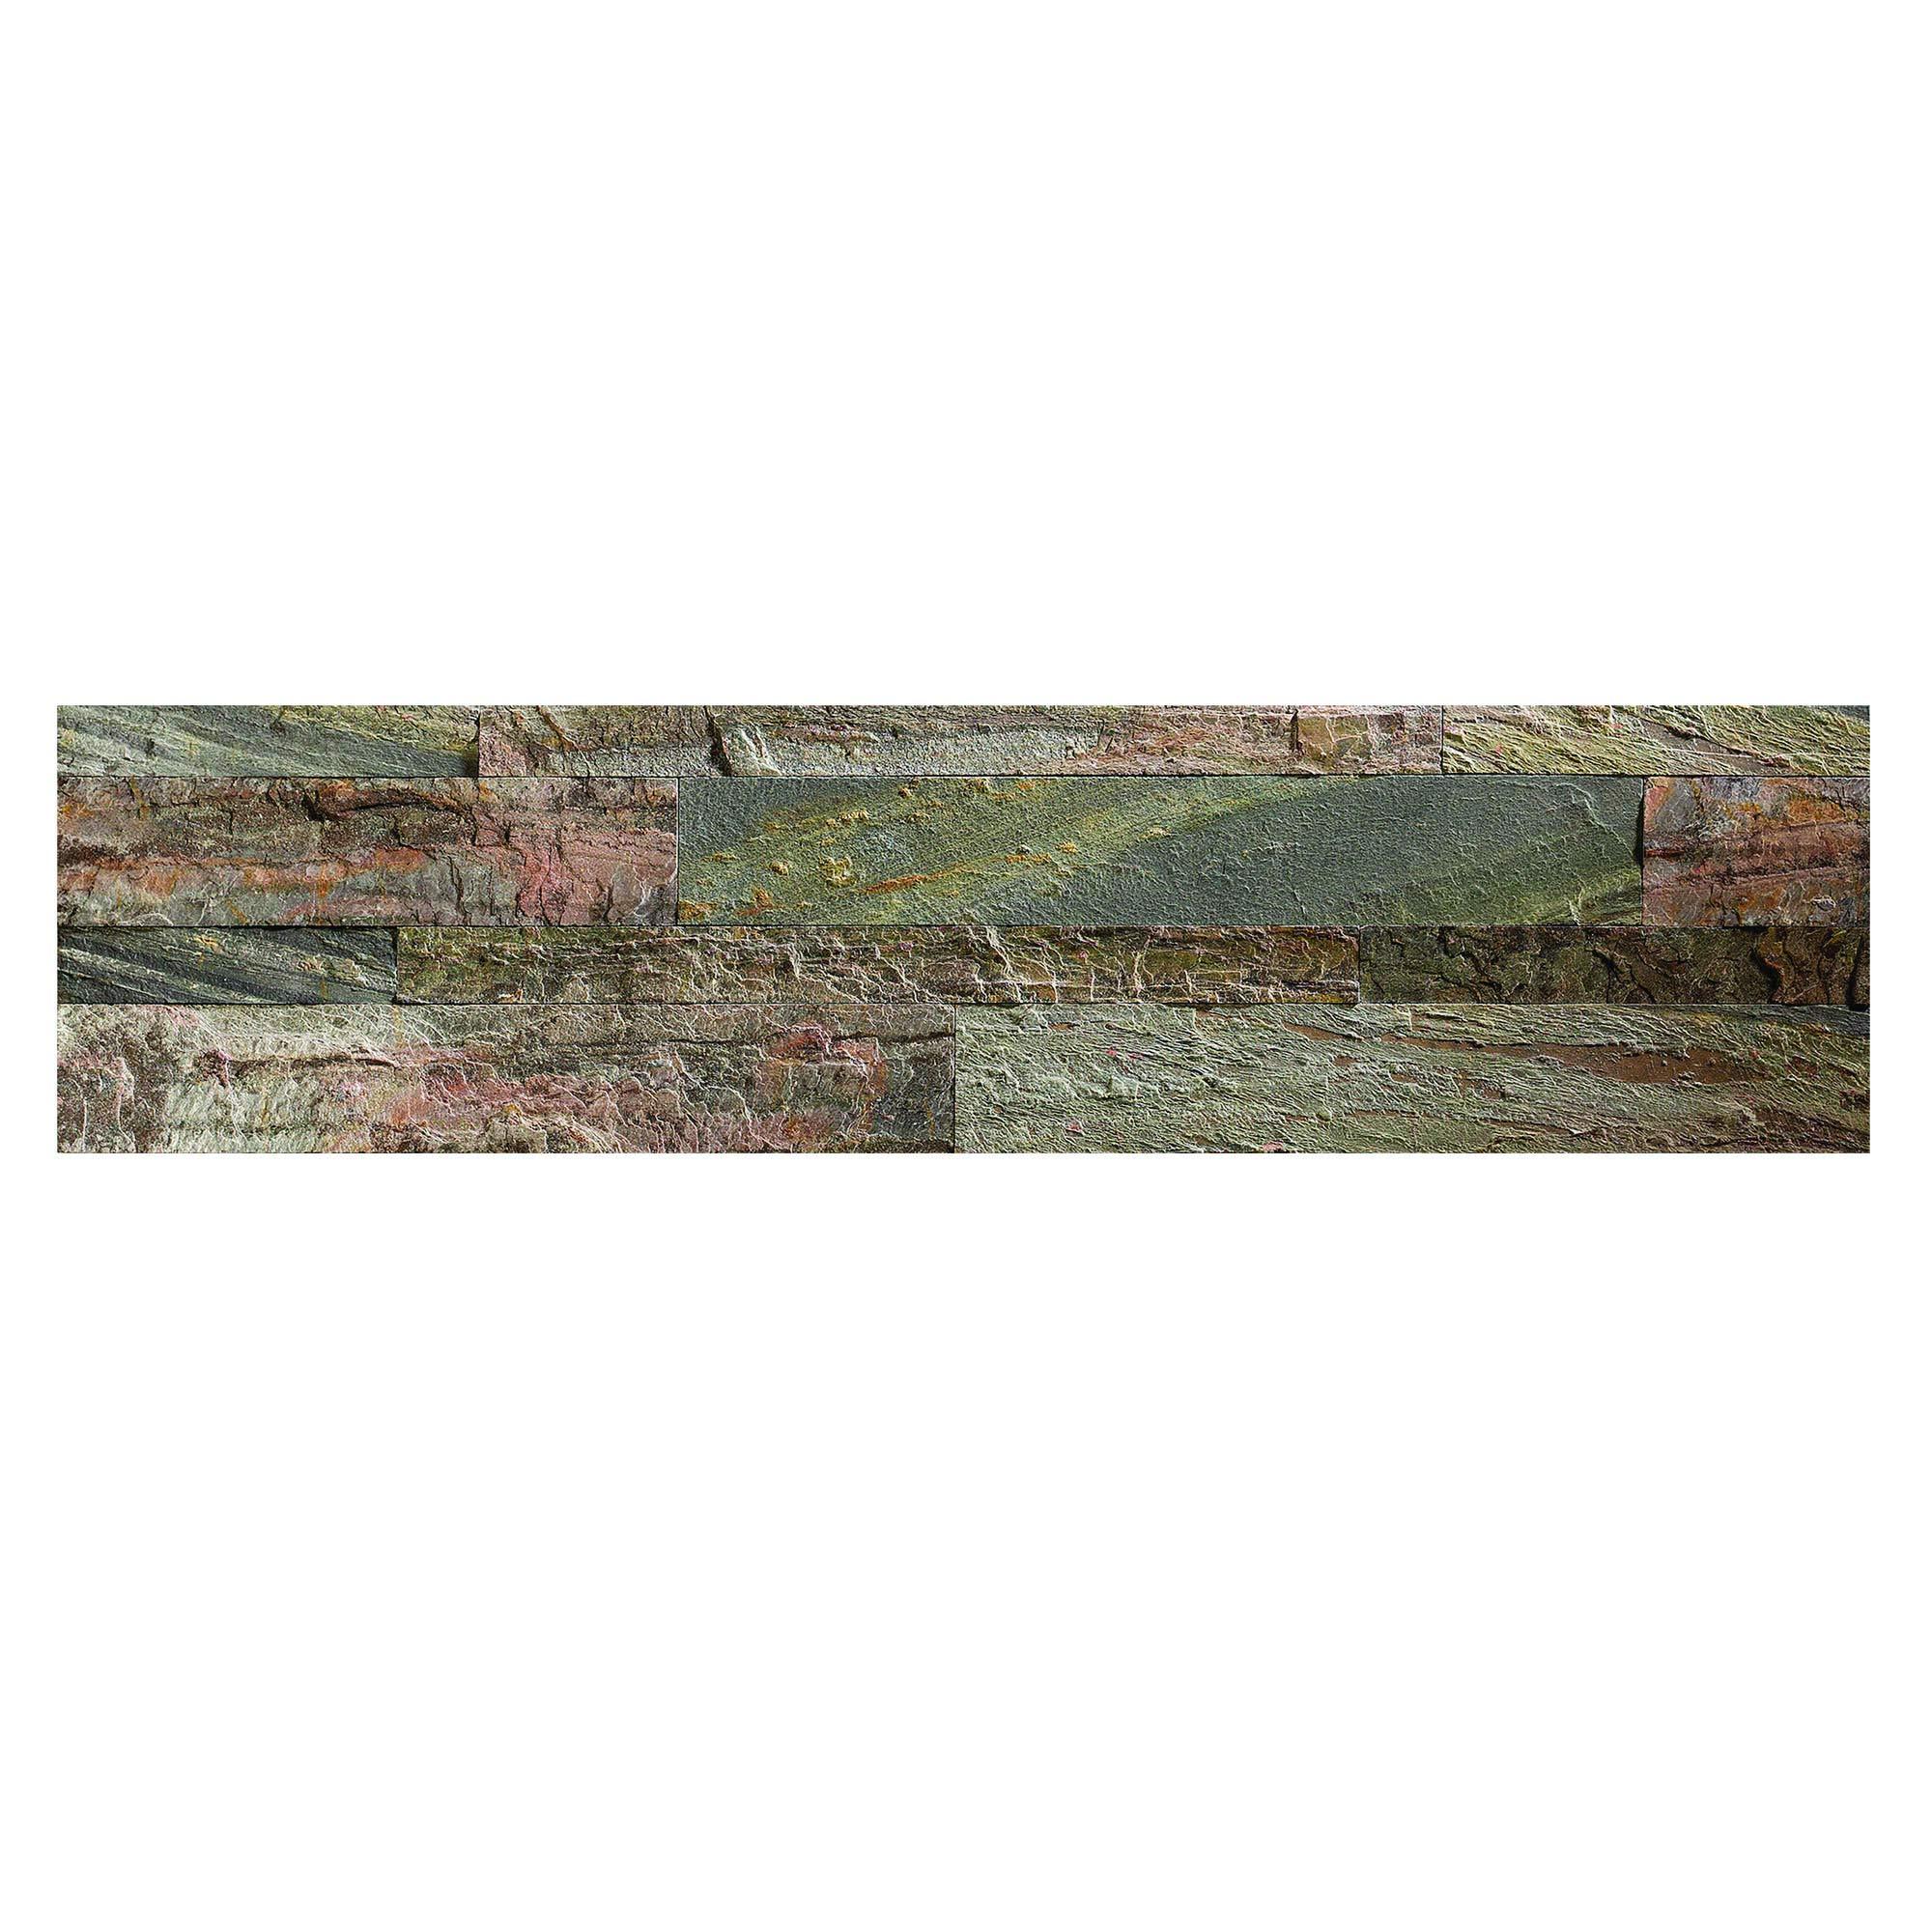 Aspect Peel and Stick Stone Overlay Kitchen Backsplash - Weathered Quartz (5.9'' x 23.6'' x 1/8'' Panel - Approx. 1 sq ft) - Easy DIY Tile Backsplash